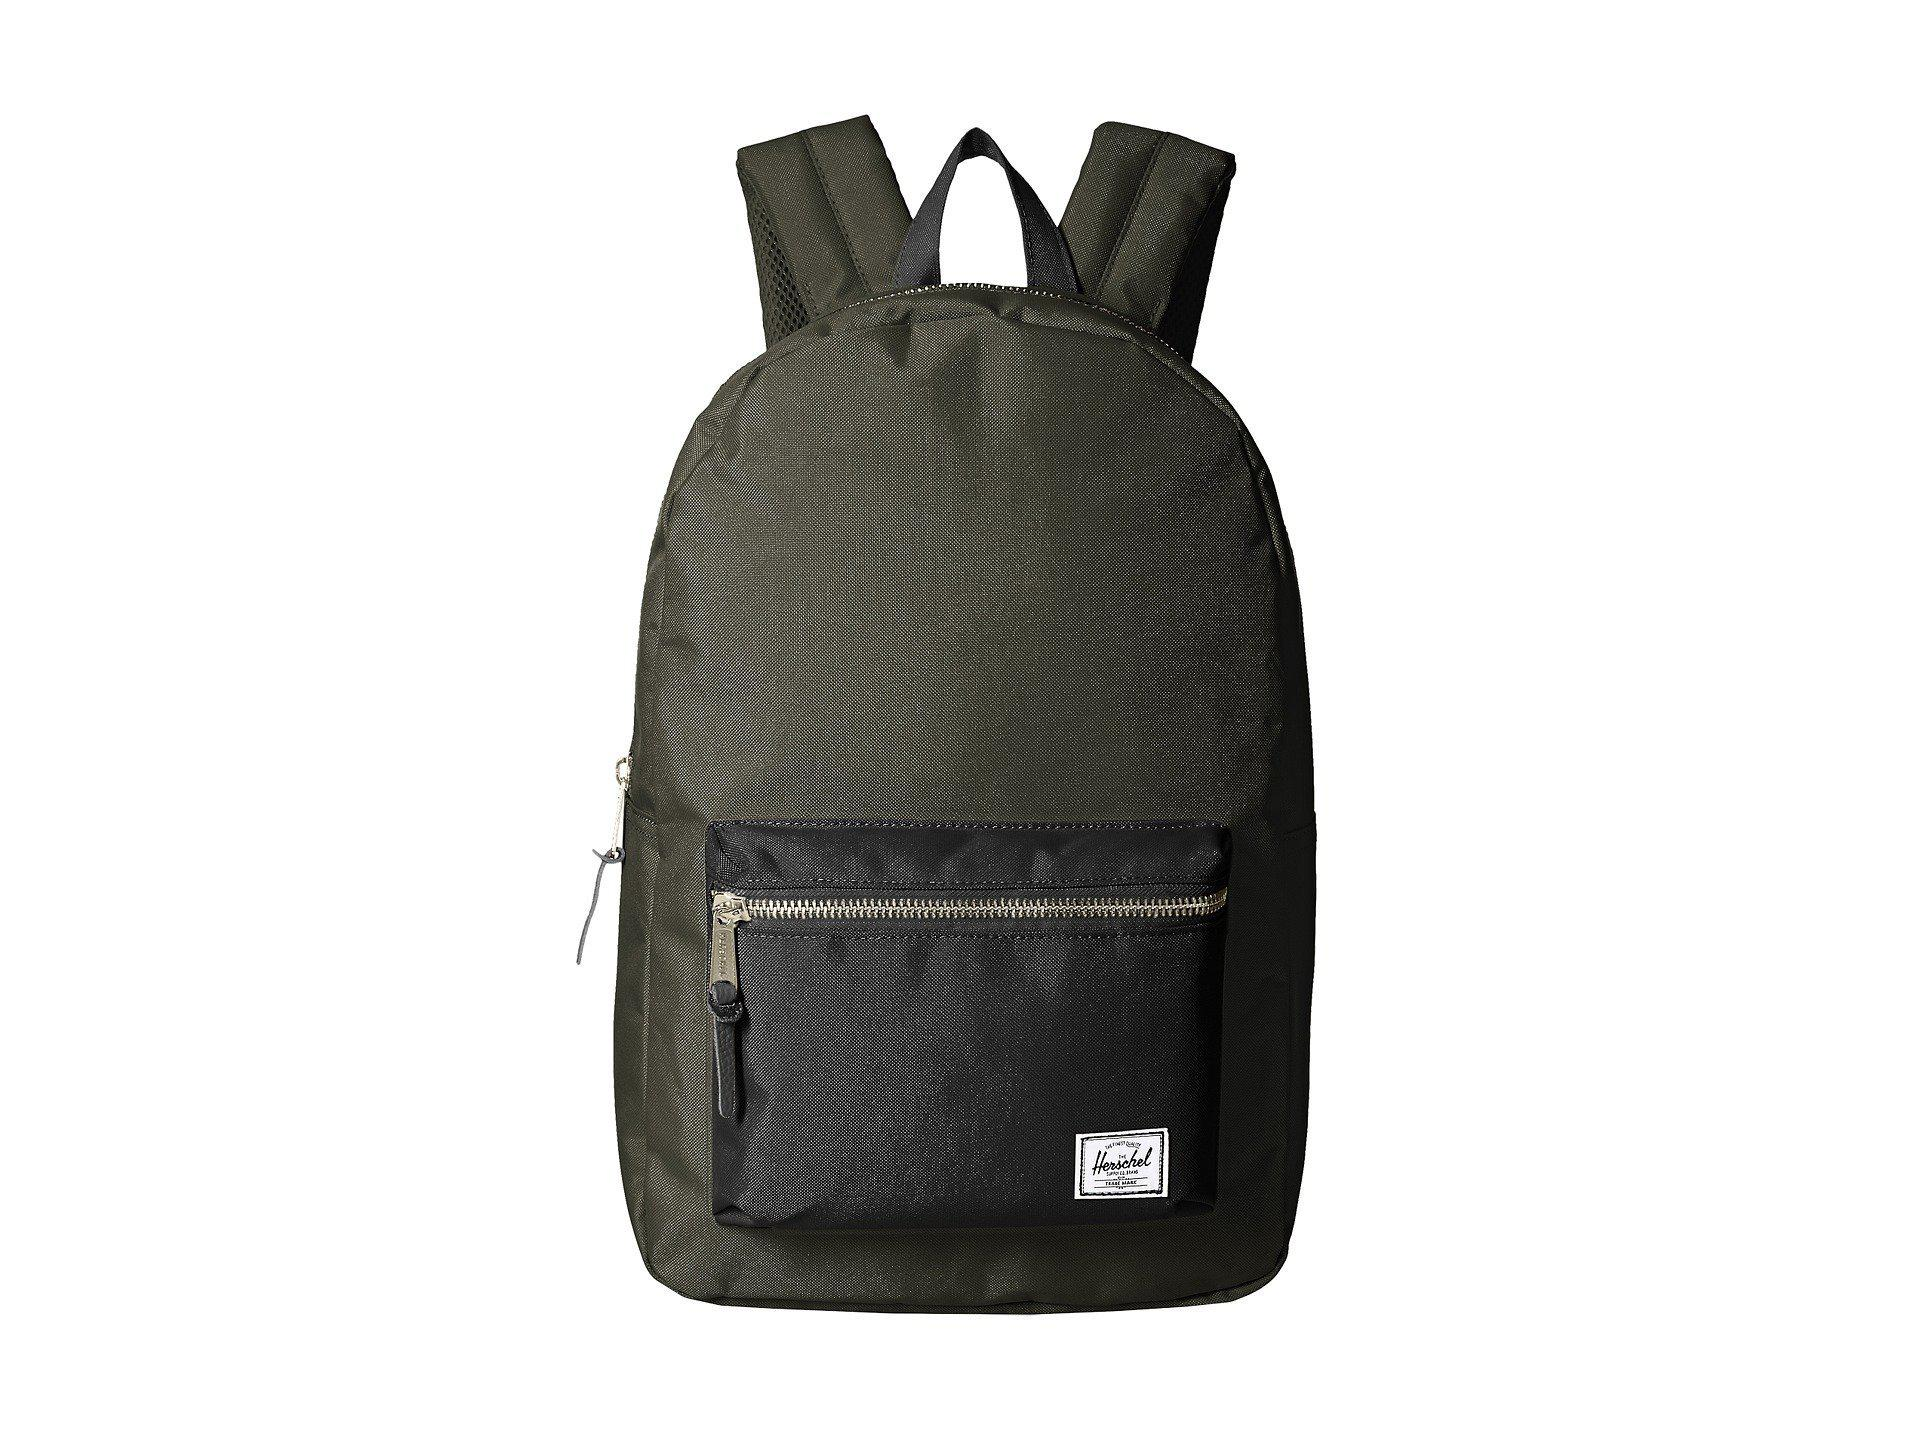 Lyst - Herschel Supply Co. Settlement (navy) Backpack Bags in Black ... fe9a297650241